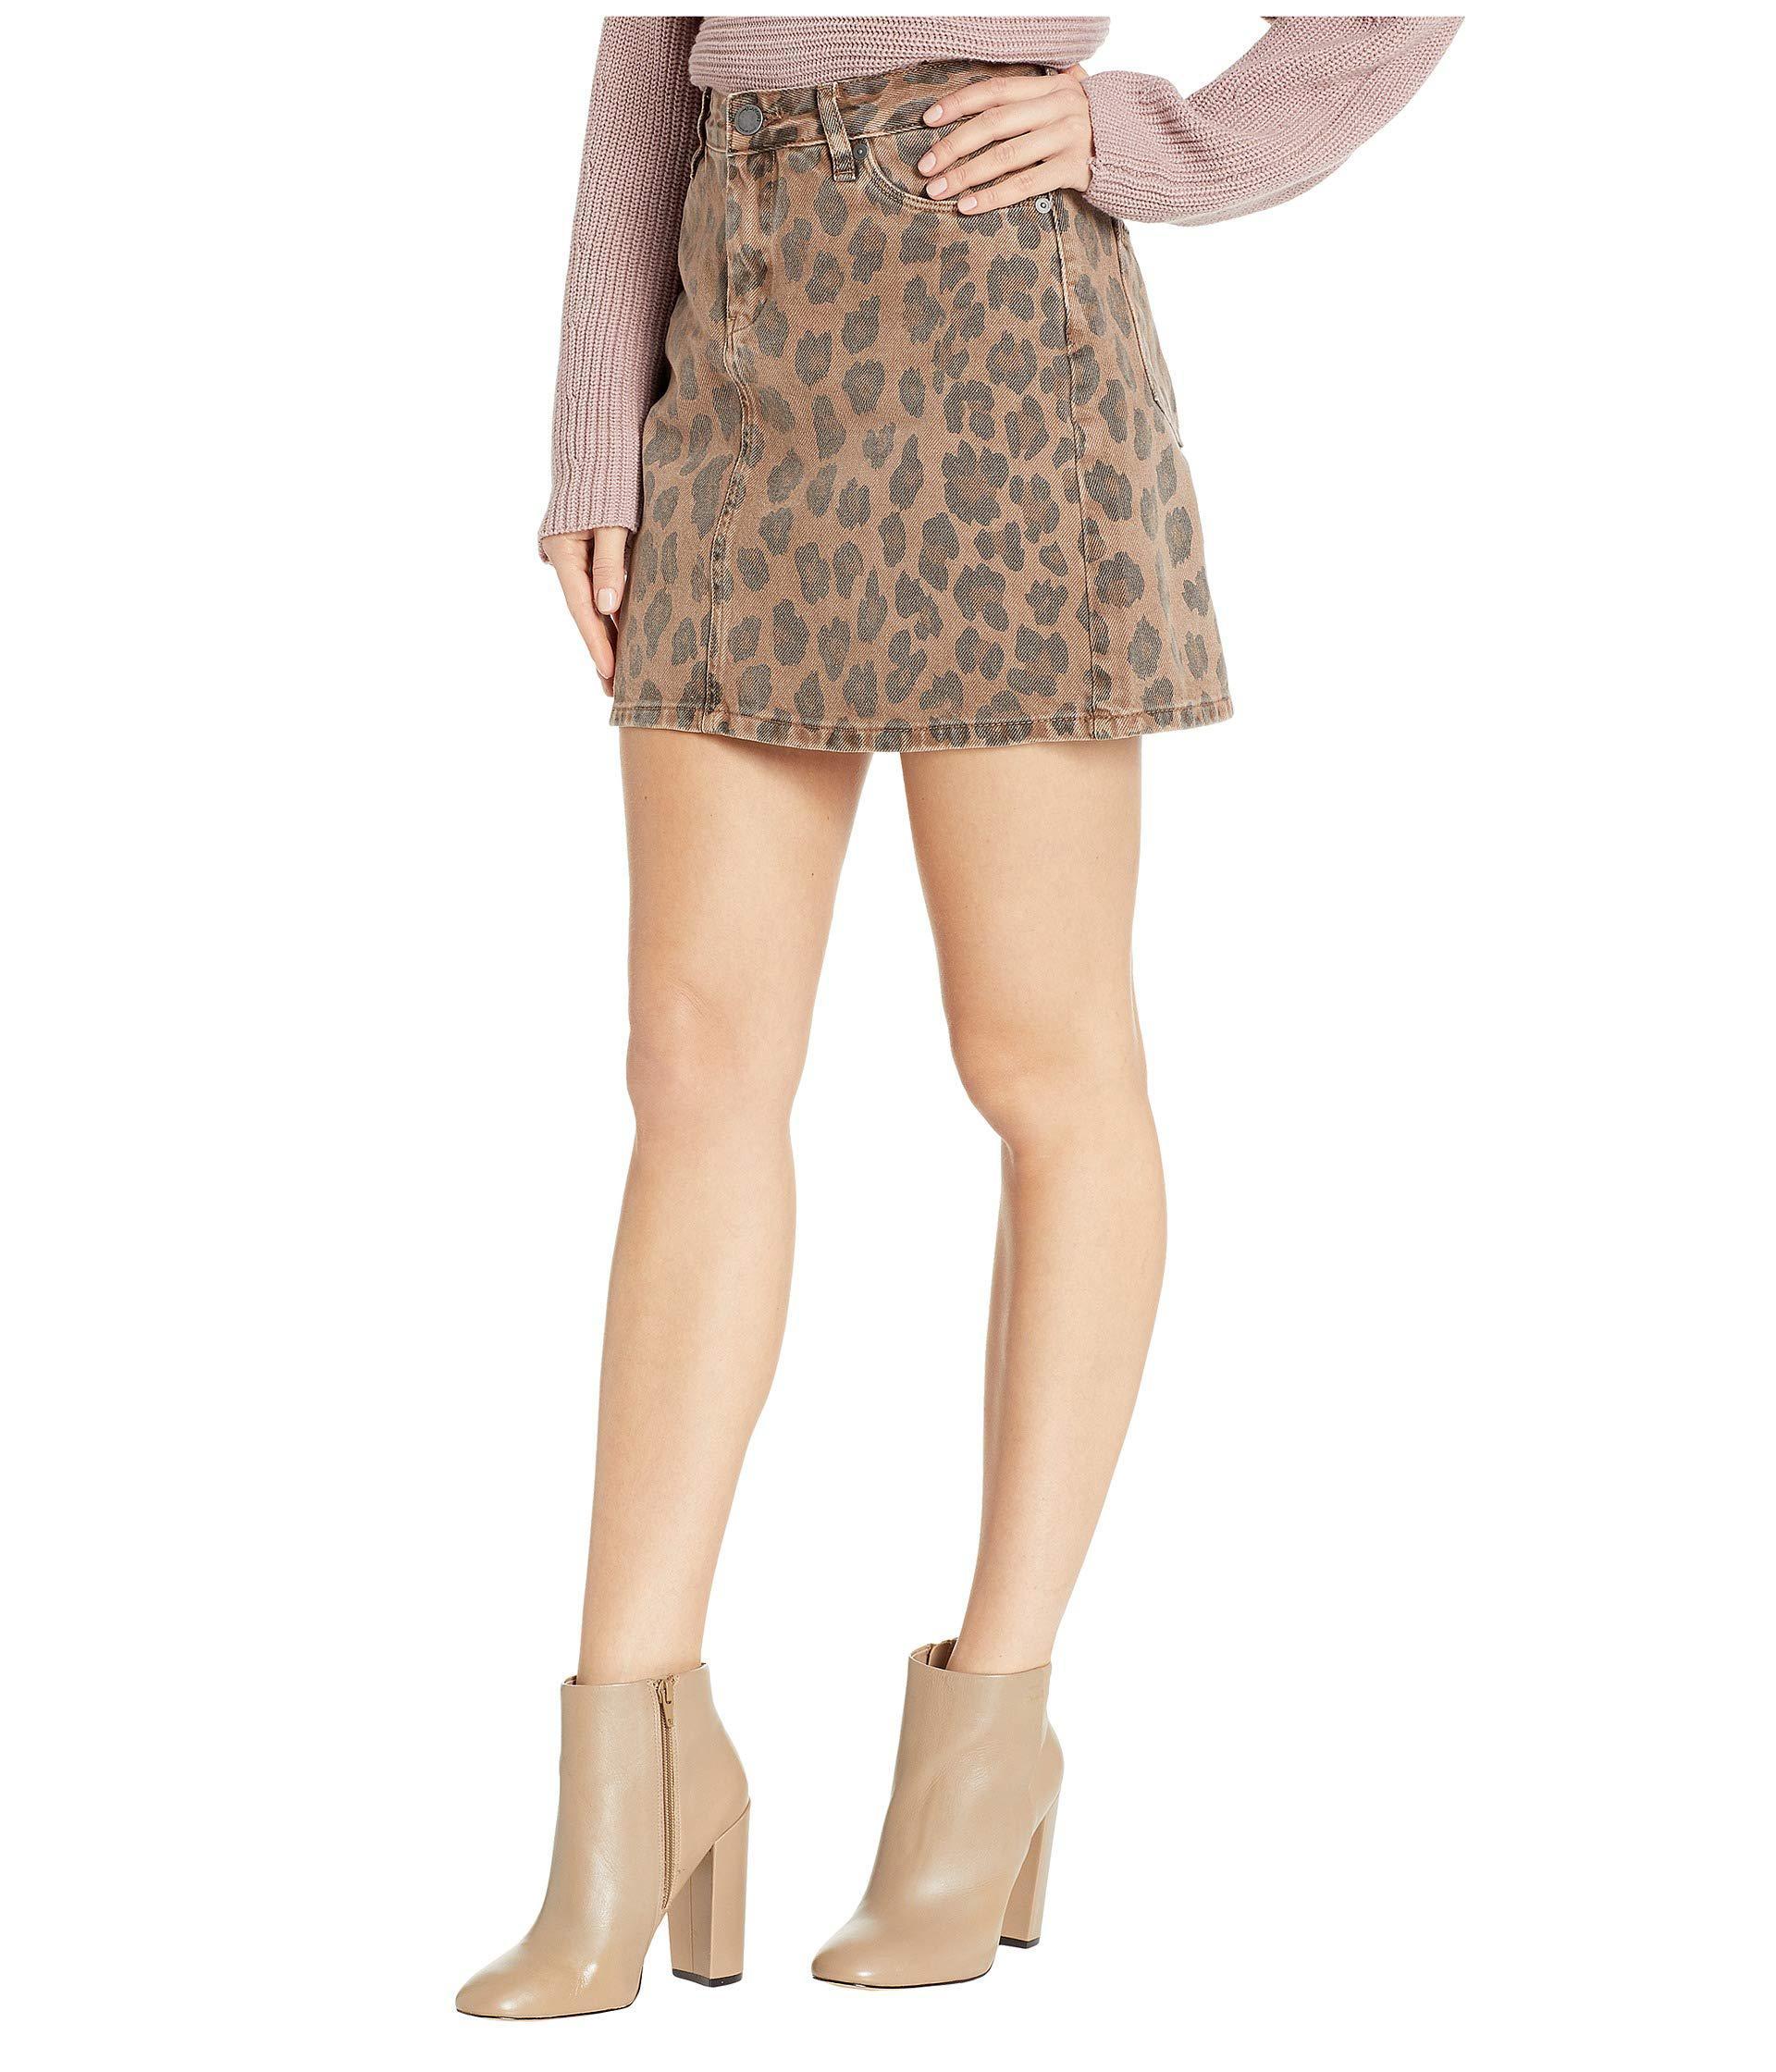 9da5227edd9 Lyst - Blank NYC Cheetah Printed Mini Skirt In Catwalk (catwalk) Women s  Skirt